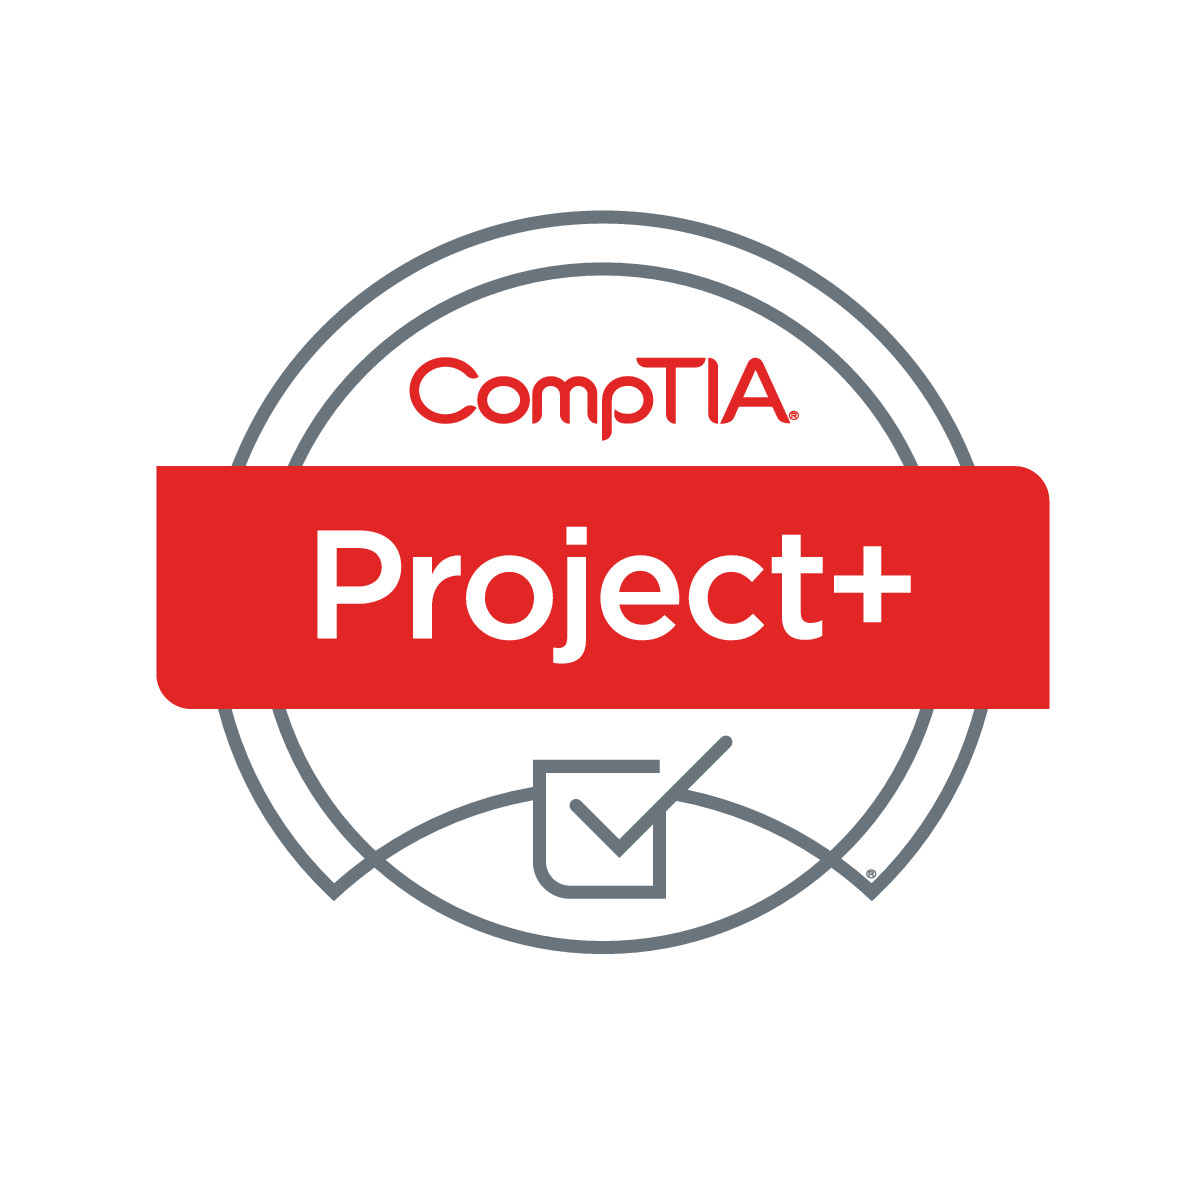 Project+ Logo